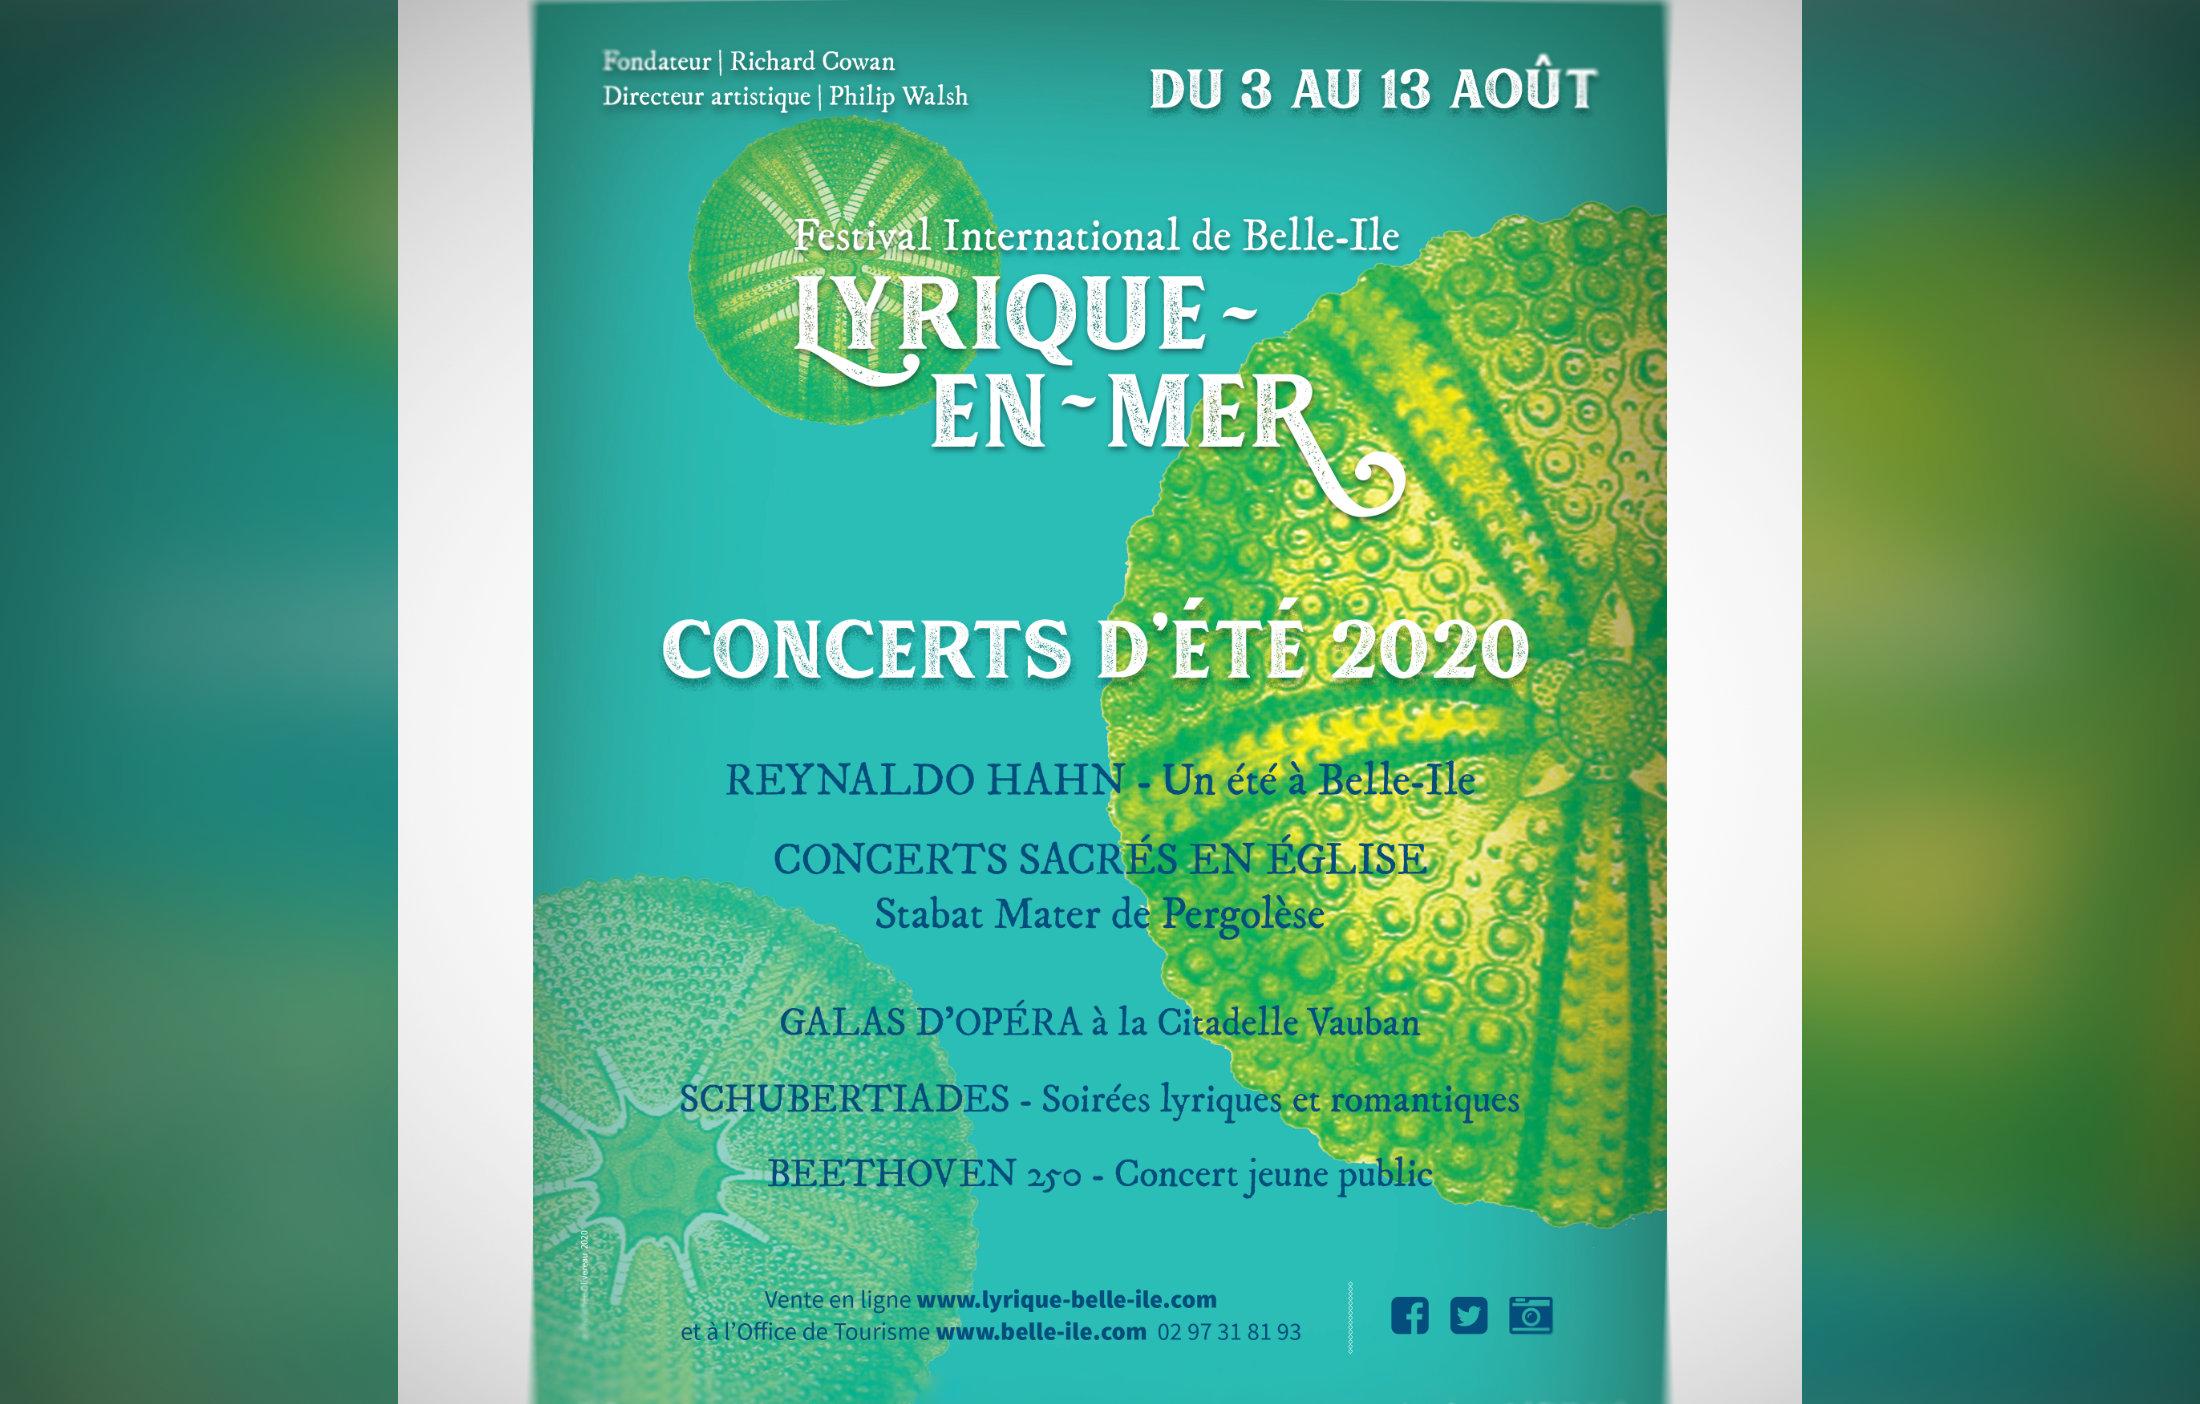 Festival-Lyrique-en-mer-2020@2x